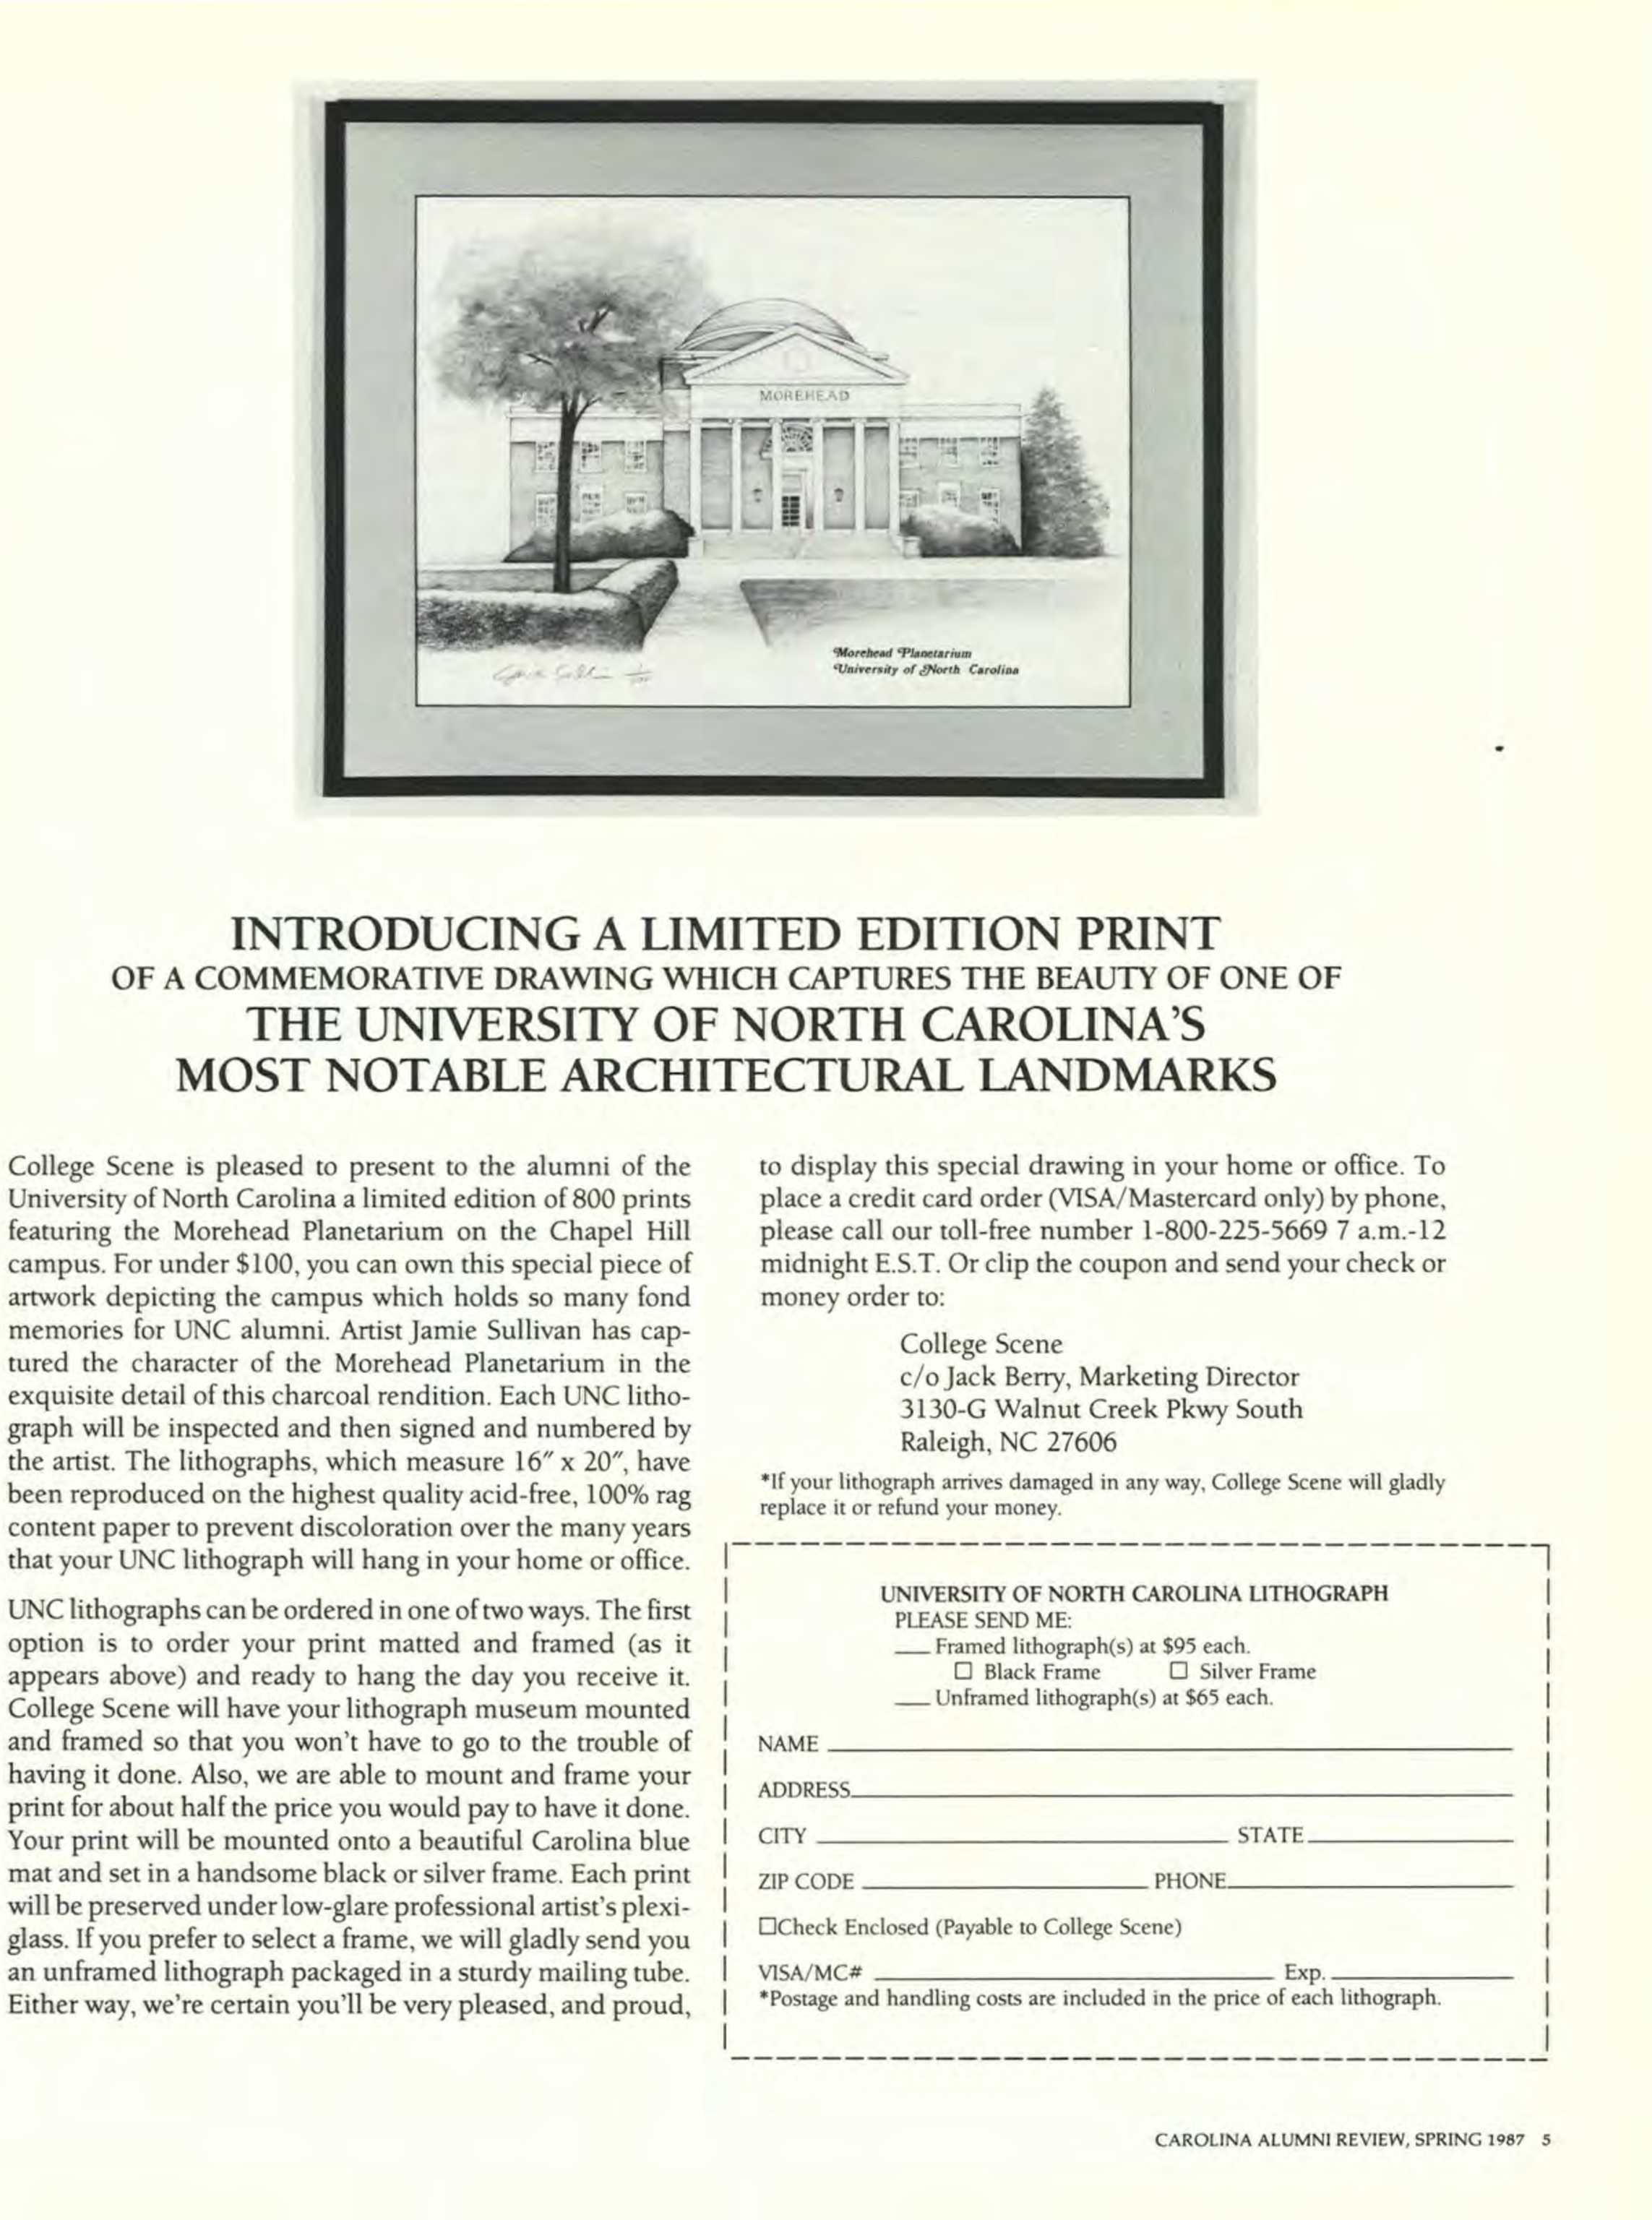 Carolina Alumni Review - Spring 1987 - page 6